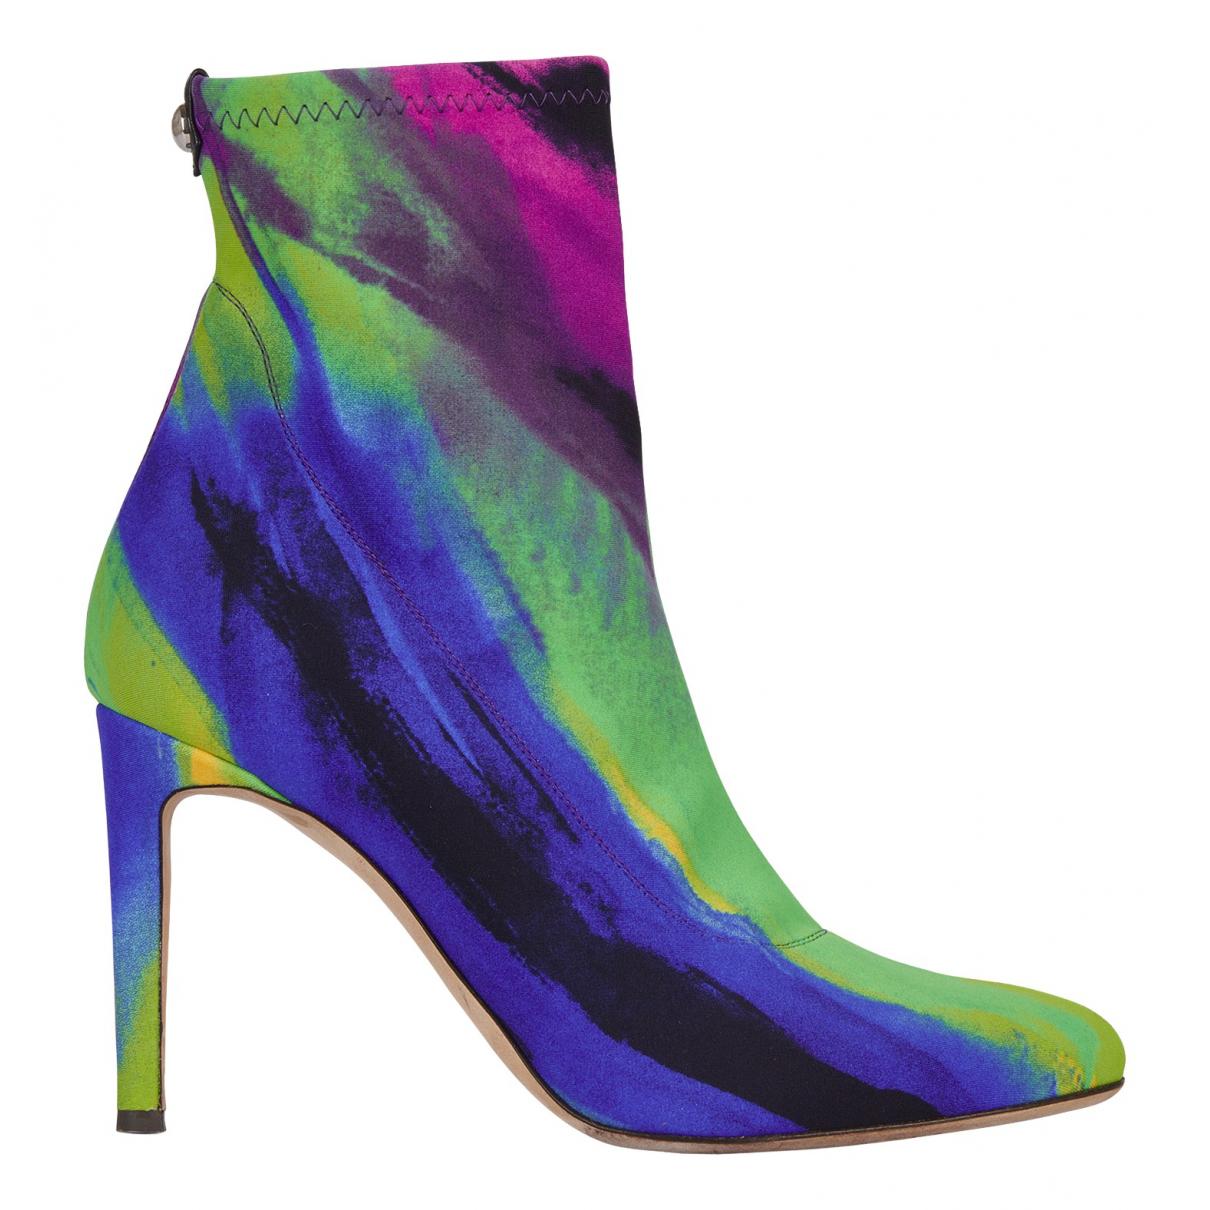 Giuseppe Zanotti - Boots   pour femme en cuir - multicolore